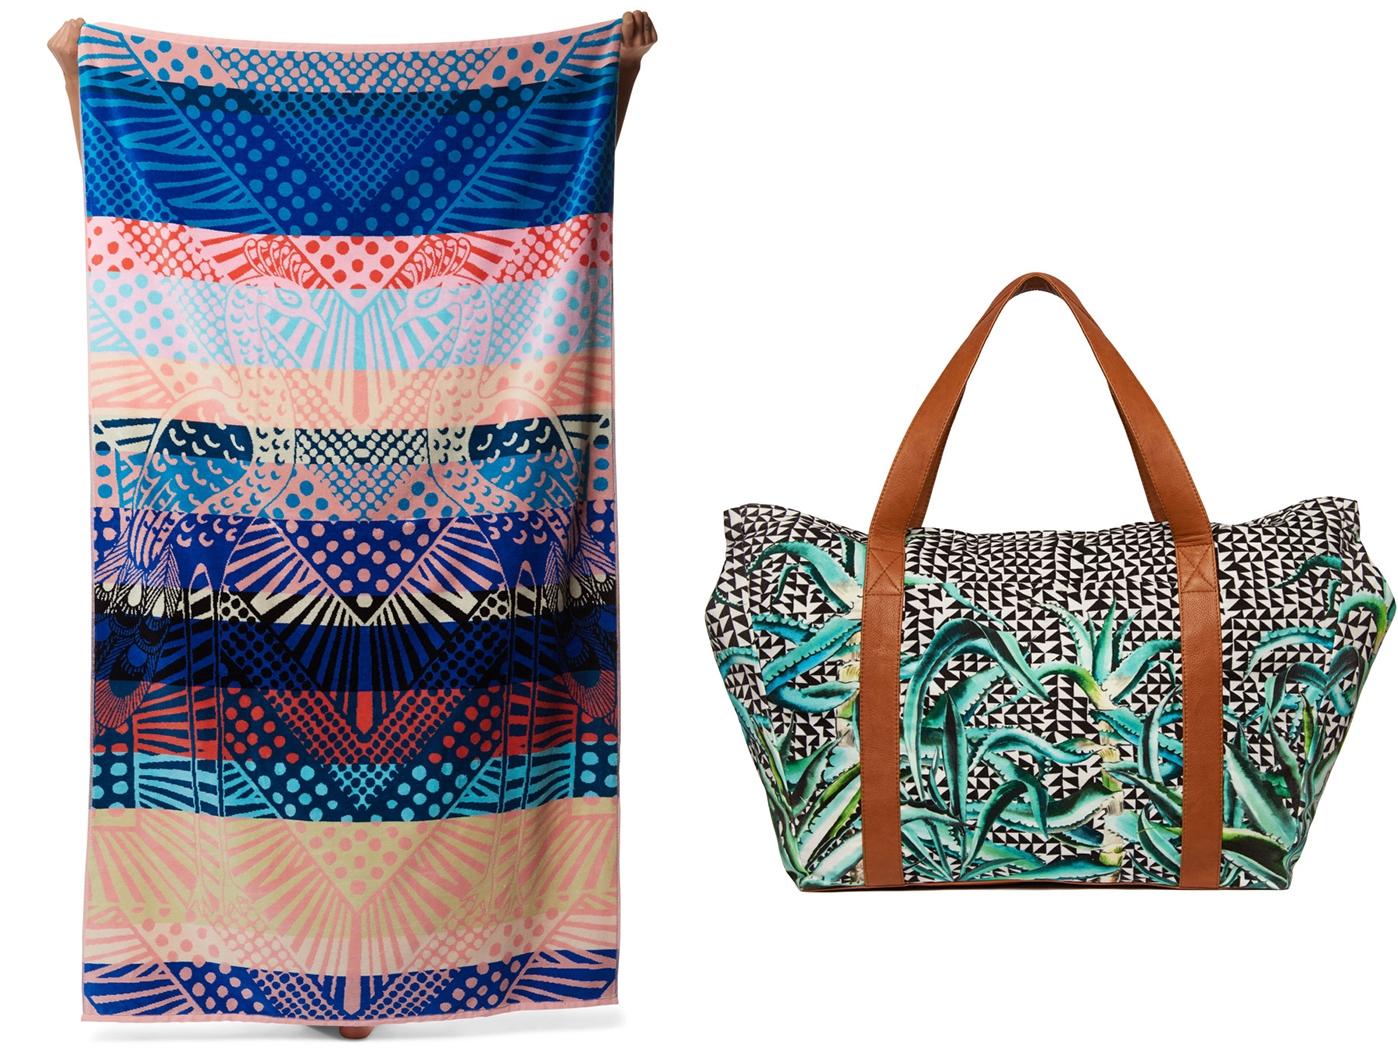 Moroccan-Chic Beach Essentials from Mara Hoffman